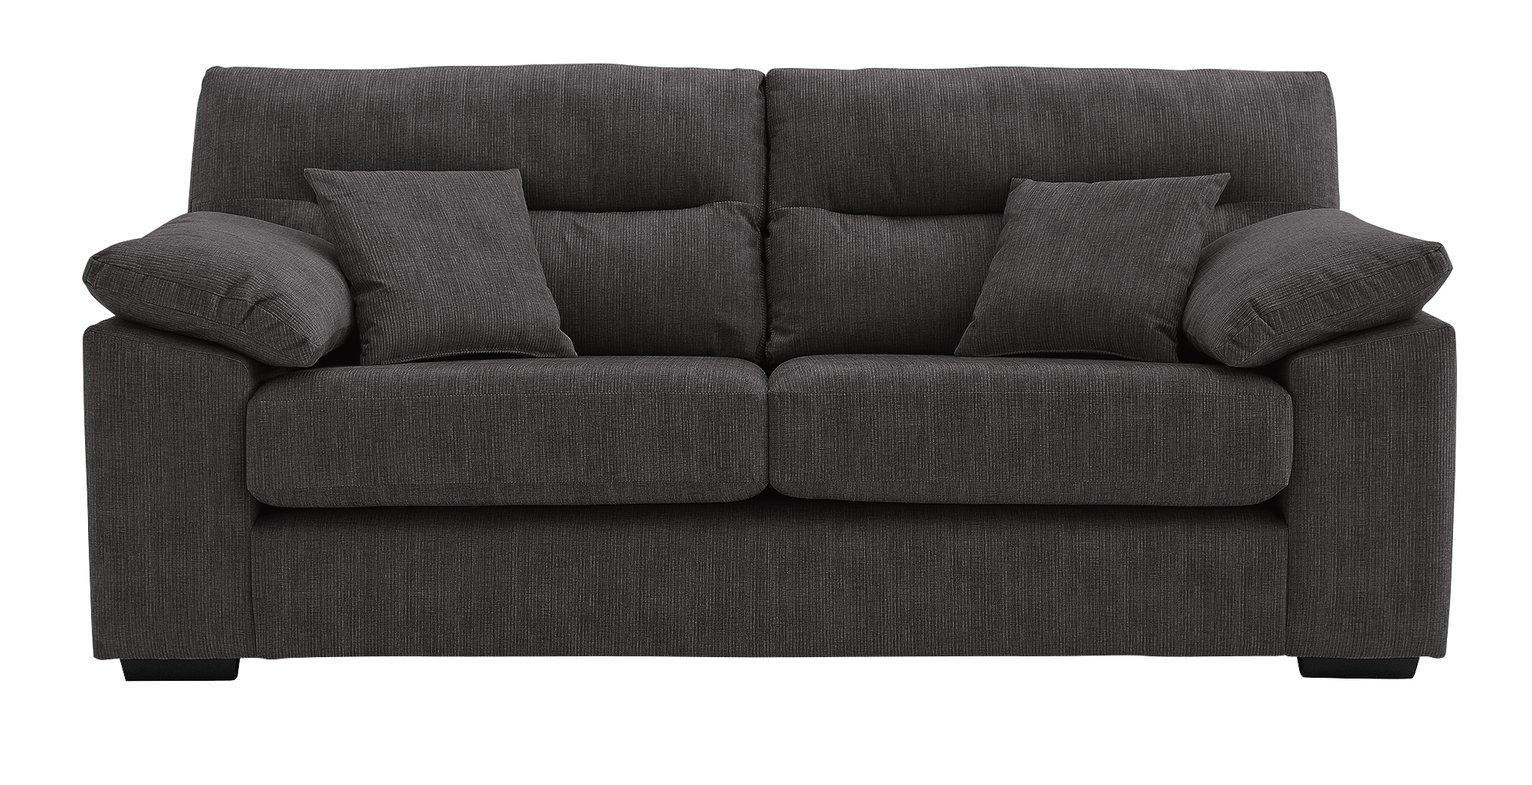 Argos Home Donavan 3 Seater Fabric Sofa - Charcoal